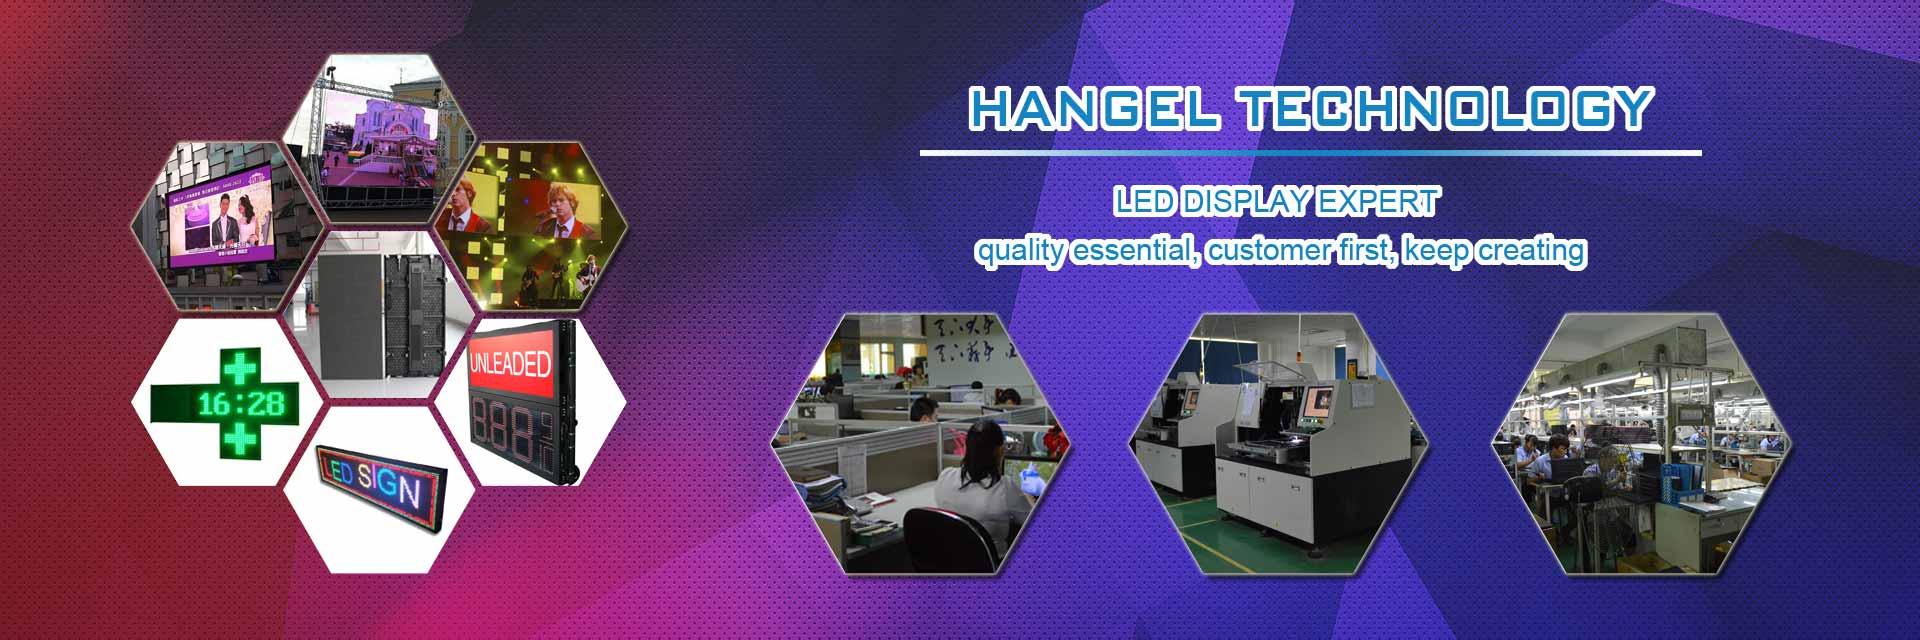 Hangel Technology Co., Limited Main Image